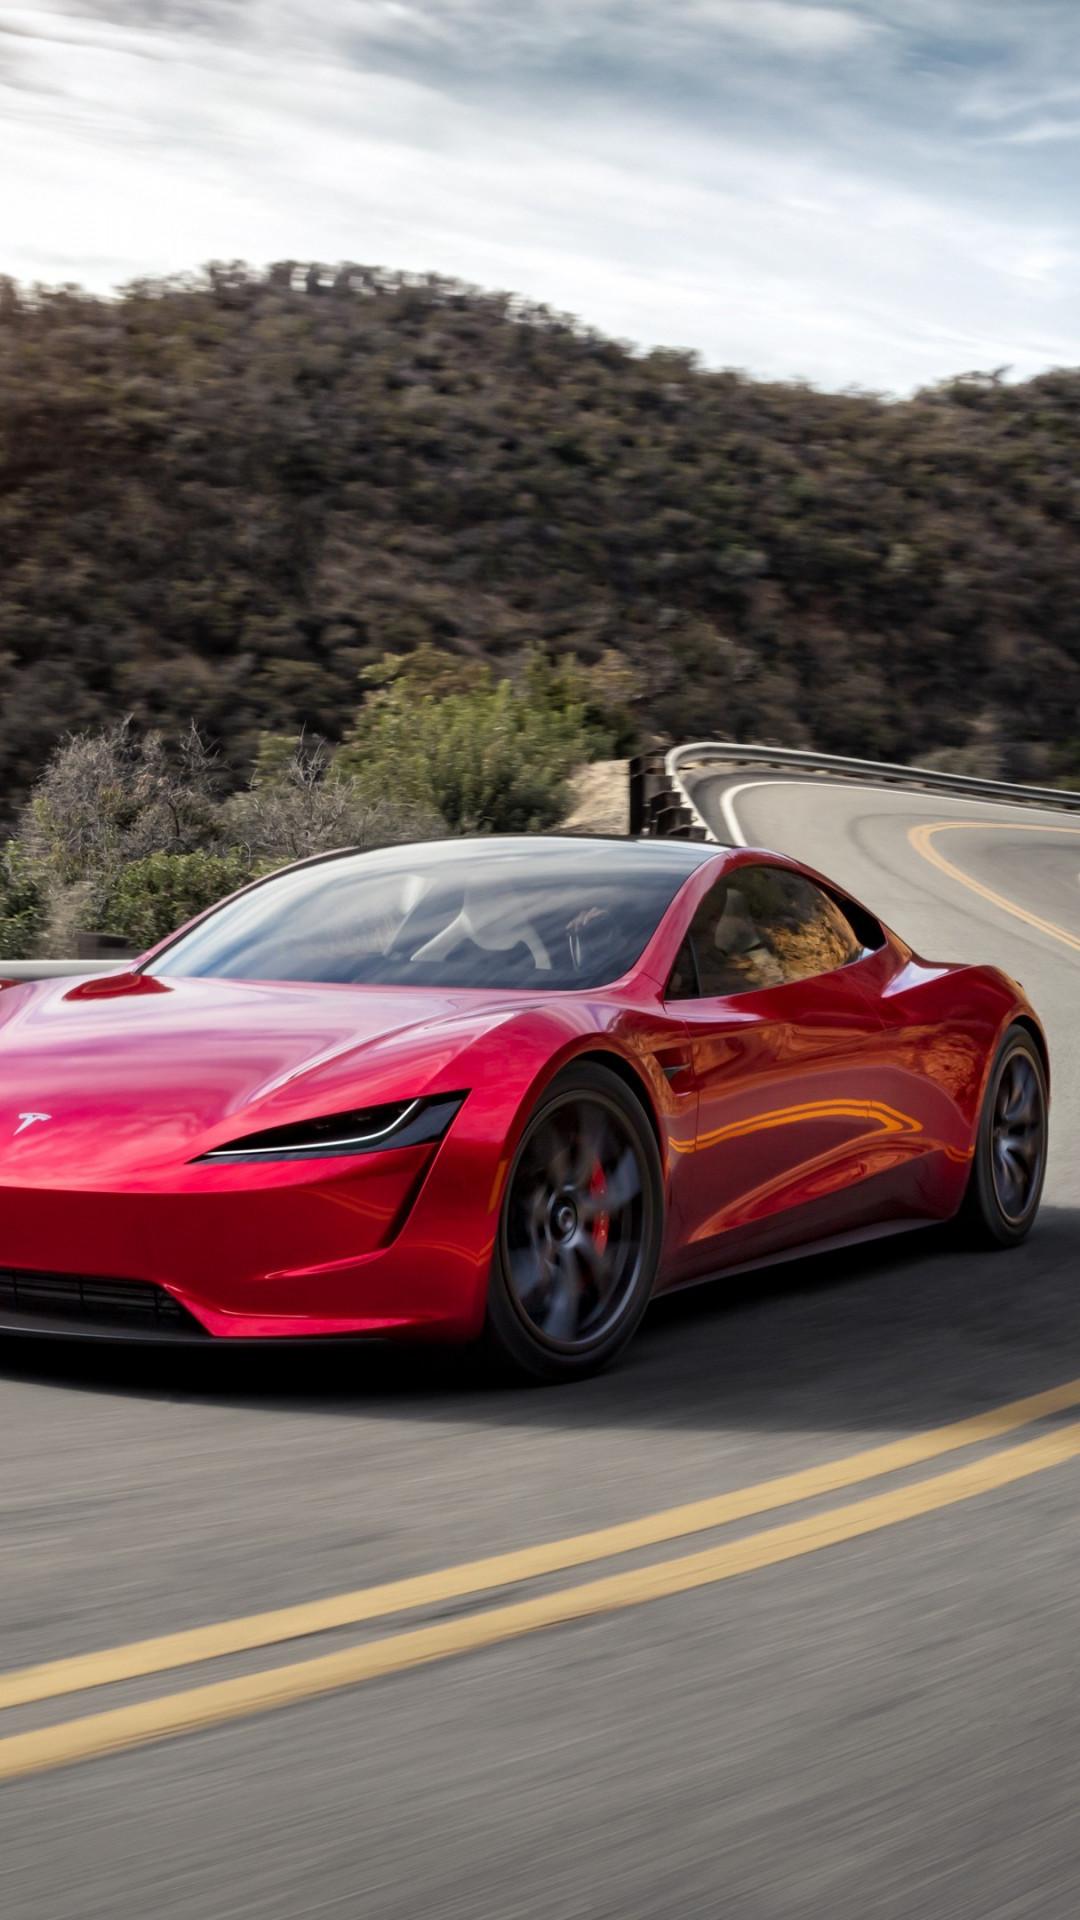 Download Wallpaper Tesla Roadster 1080x1920